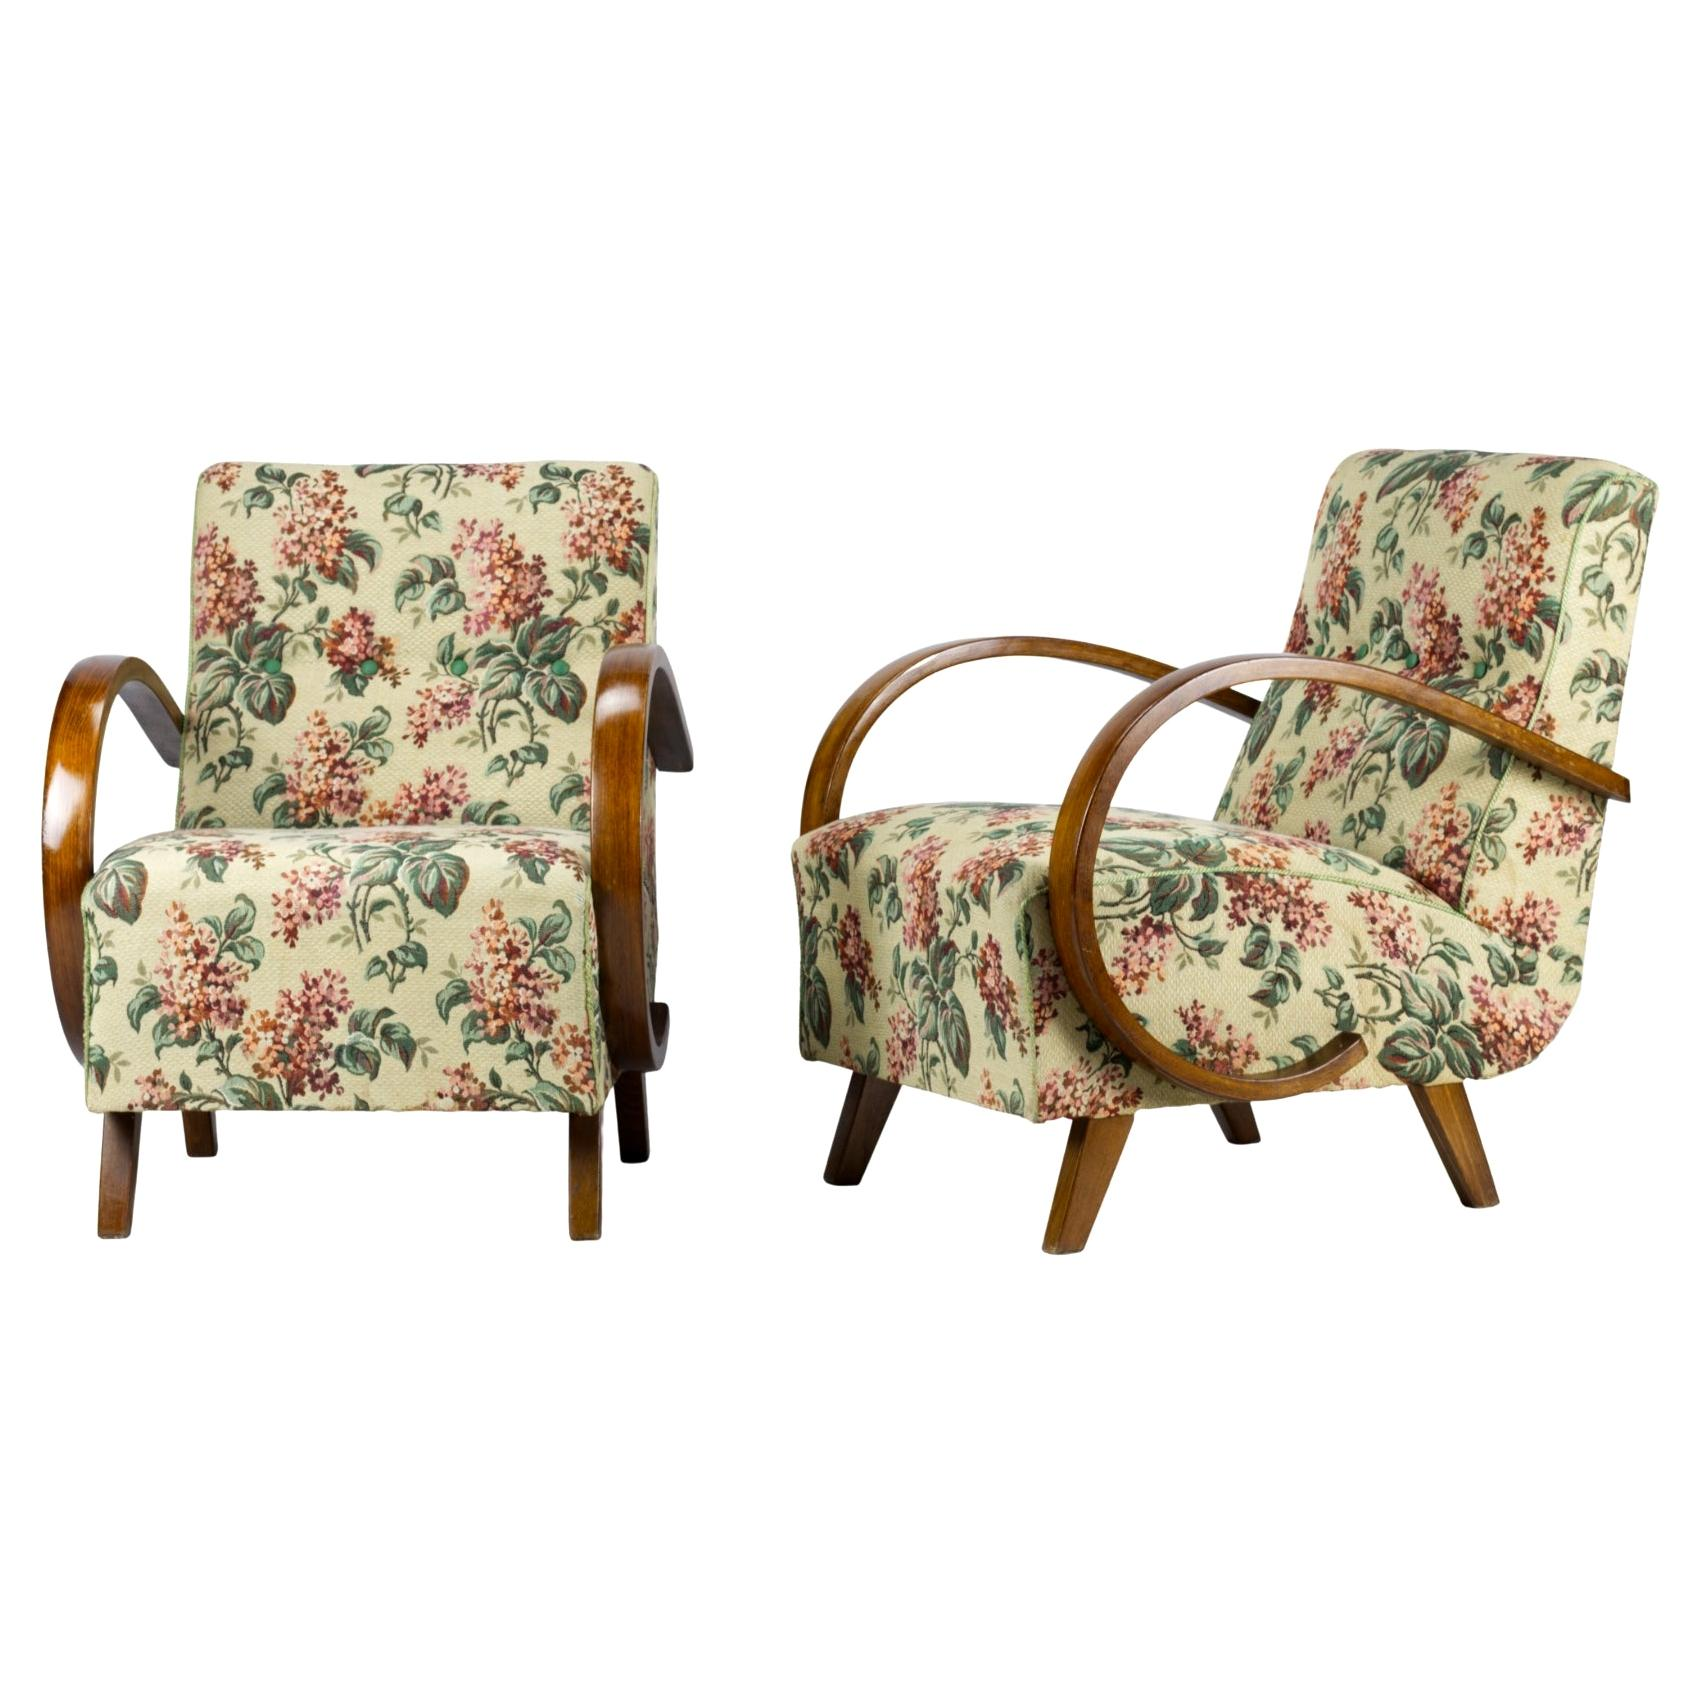 Art Deco Lounge Chairs by Jindrich Halabala for UP Zavody Brno, 1930s